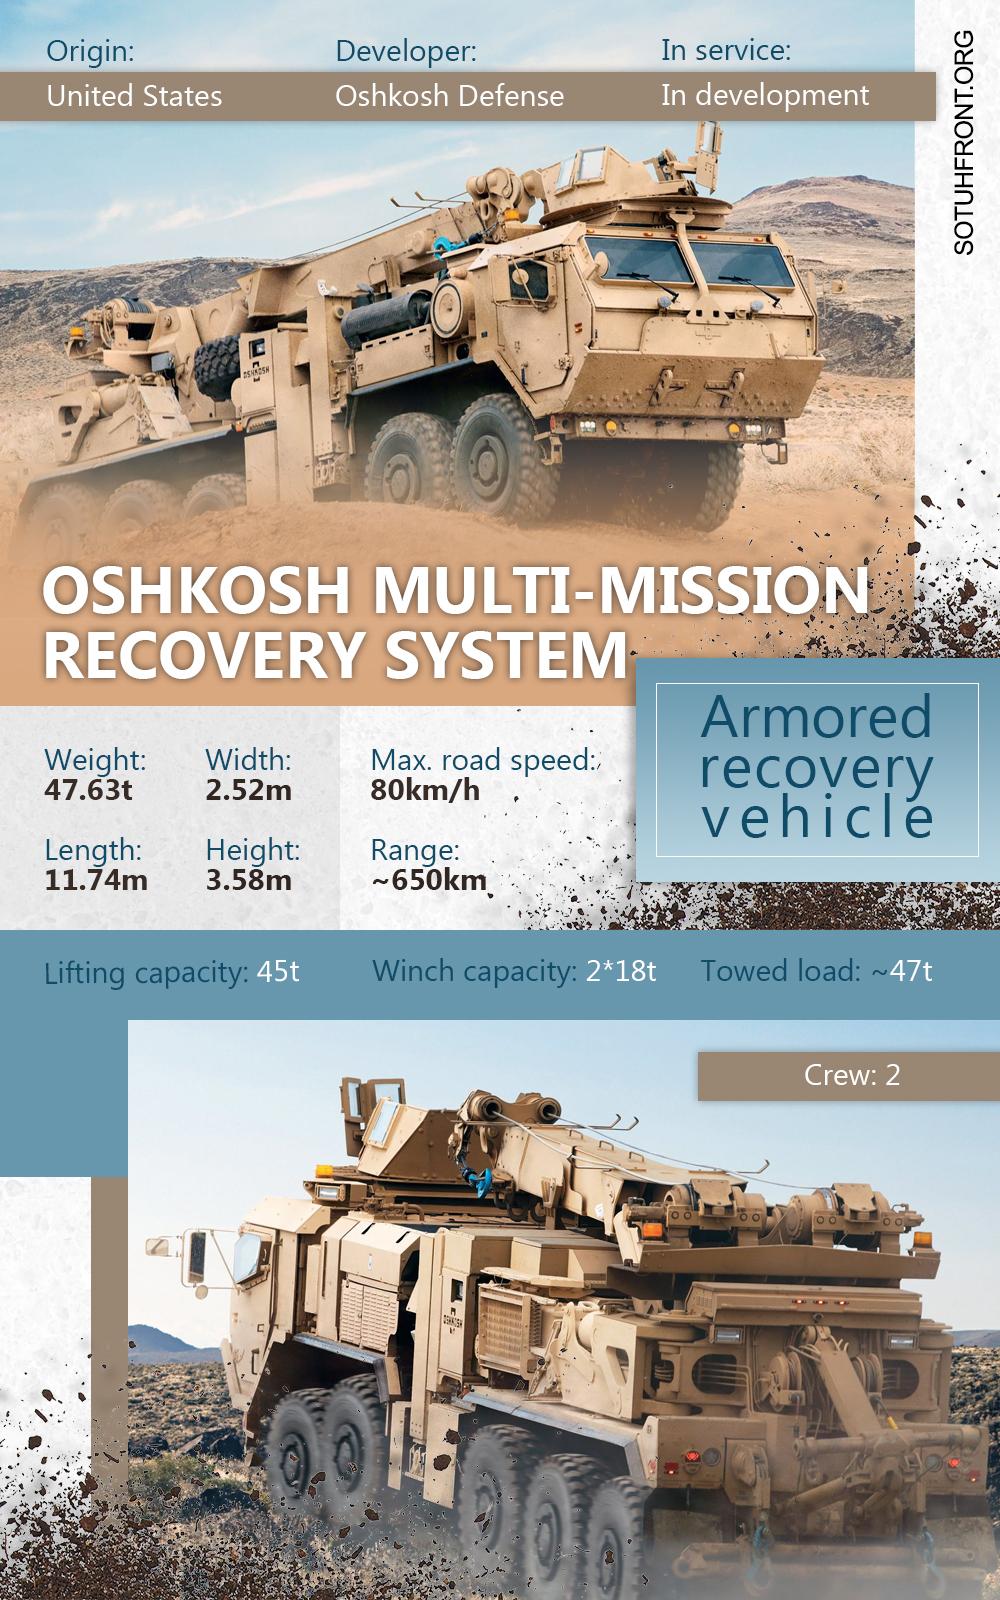 Oshkosh MMRS Heavy Recovery Vehicle (Infographics)